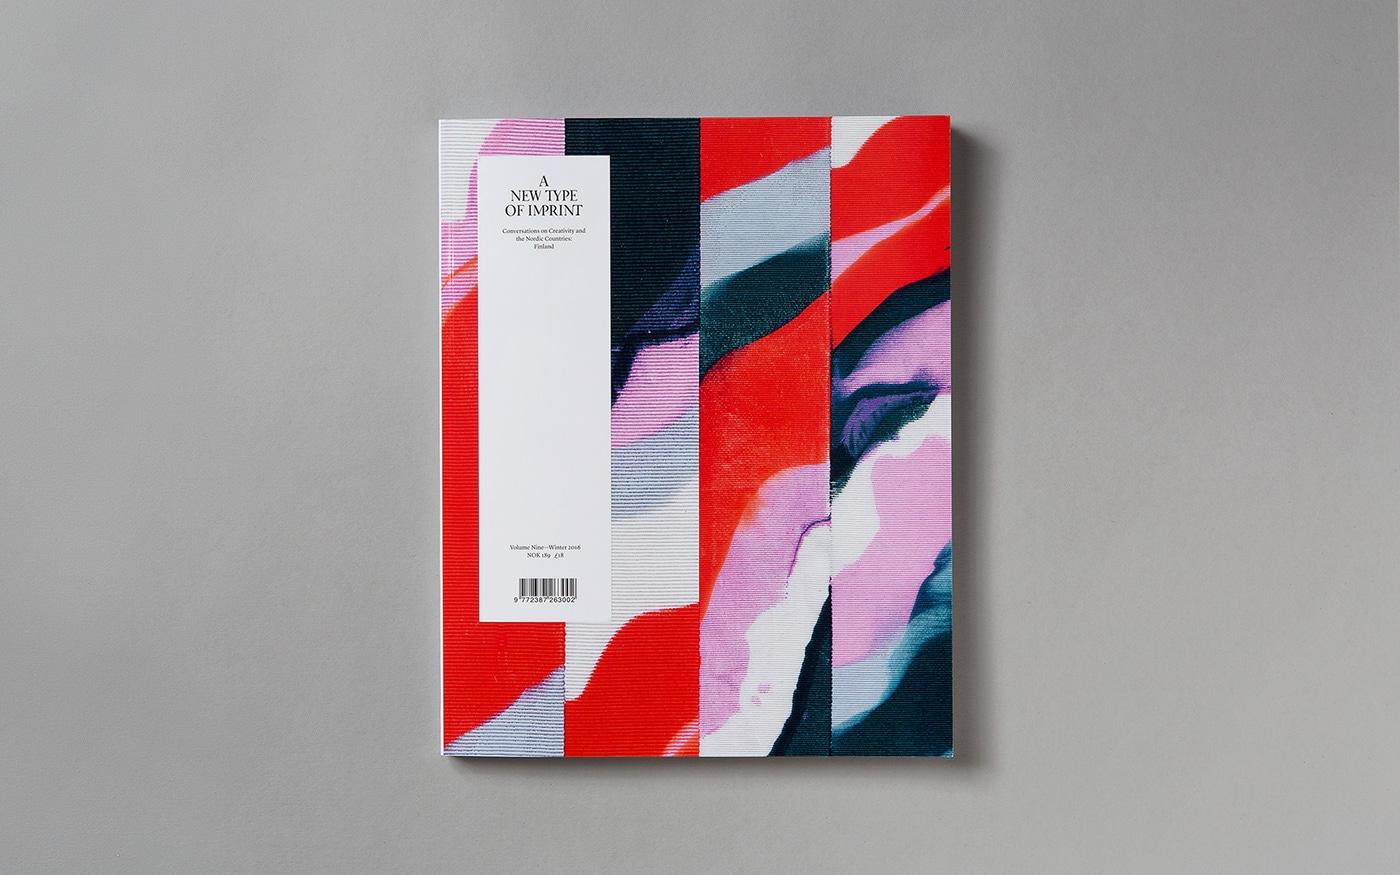 2017 graphic print design trends pattern arts crafts artistic paint